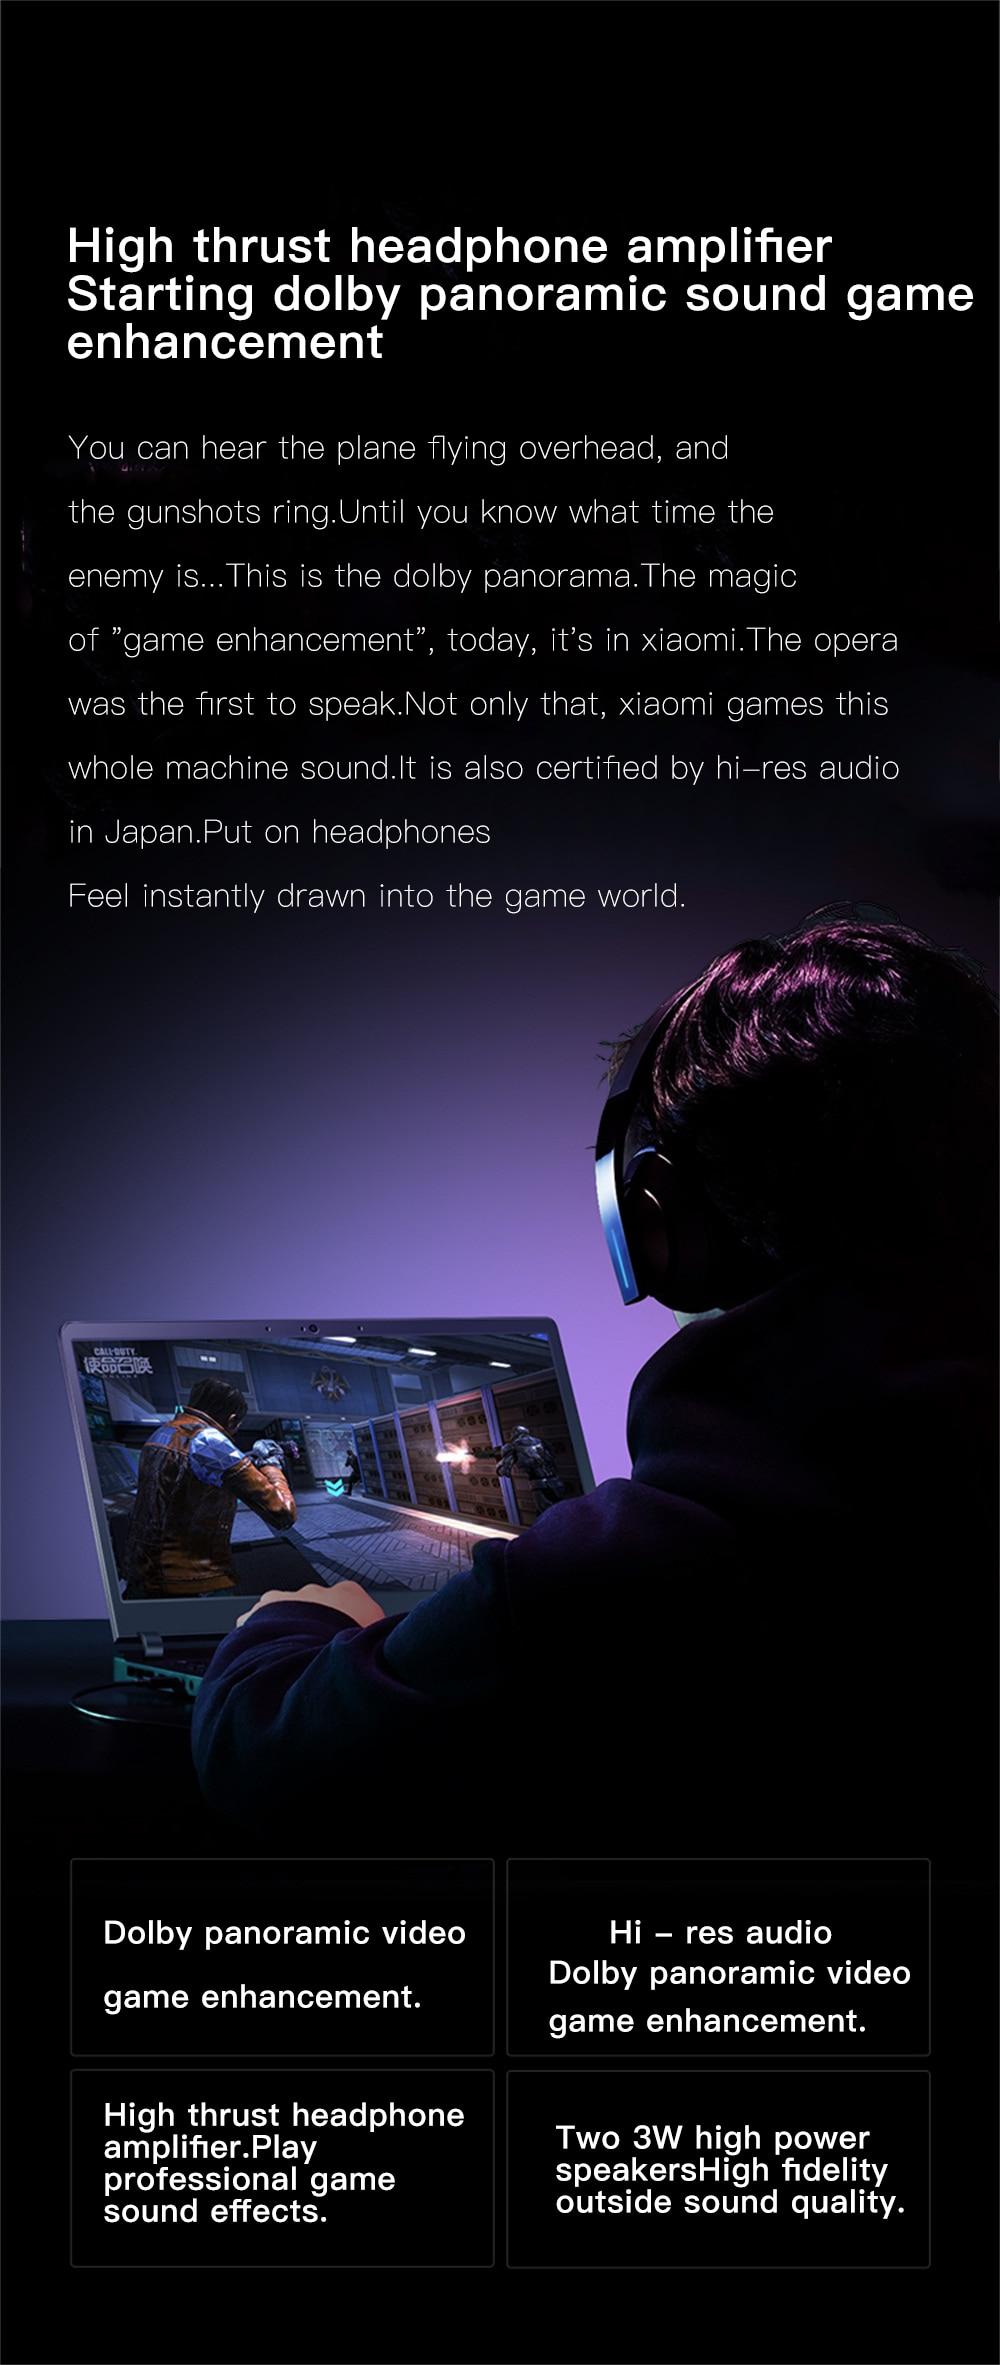 Xiaomi Mi Gaming Notebook 15.6 Intel Core 8G+1258G/16G 256GB Windows 10 Quad-core NVIDIA GeForce GTX 1060 I7-7700HQ 9